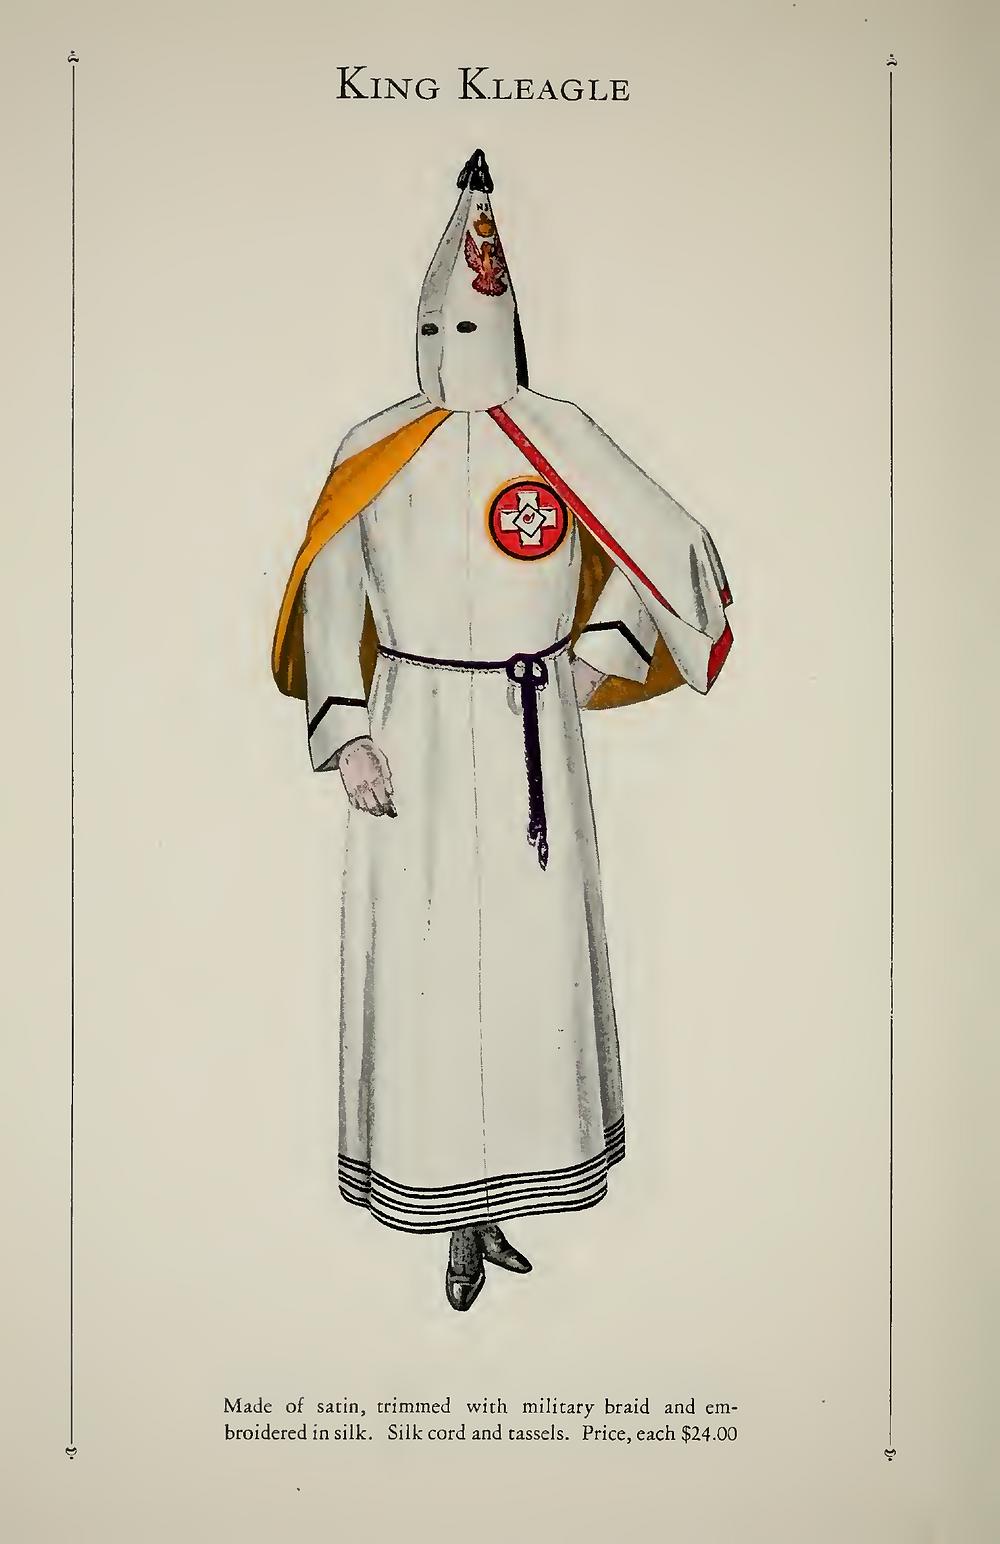 KKK Mart